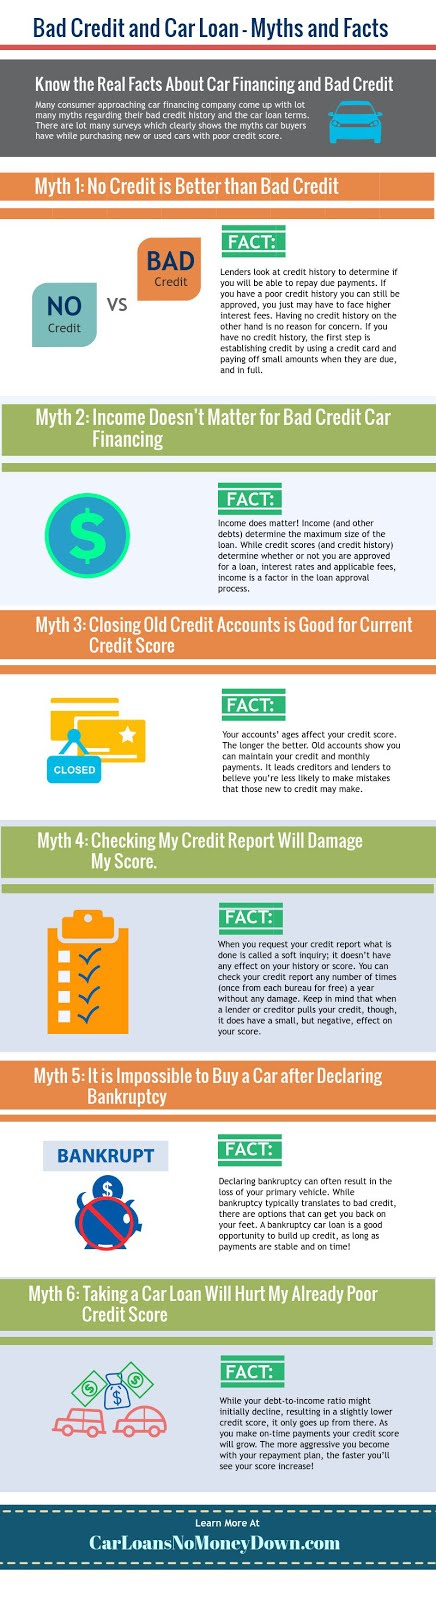 Refinancing Car Loan With Bad Credit Bad Credit Auto Loan Refinance